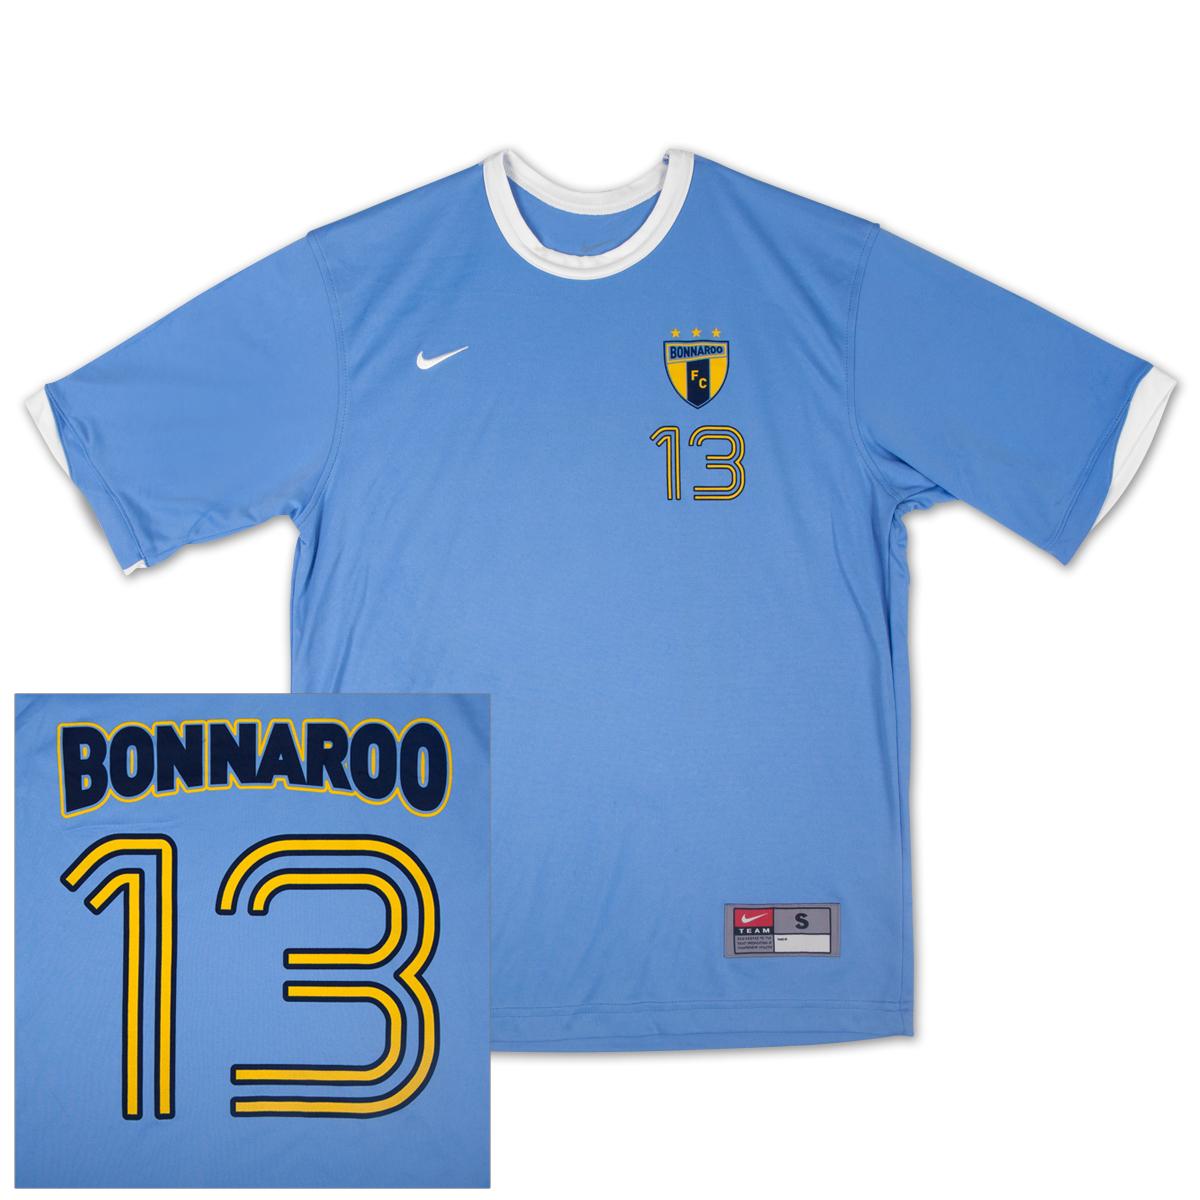 Bonnaroo 2013 Soccer Jersey